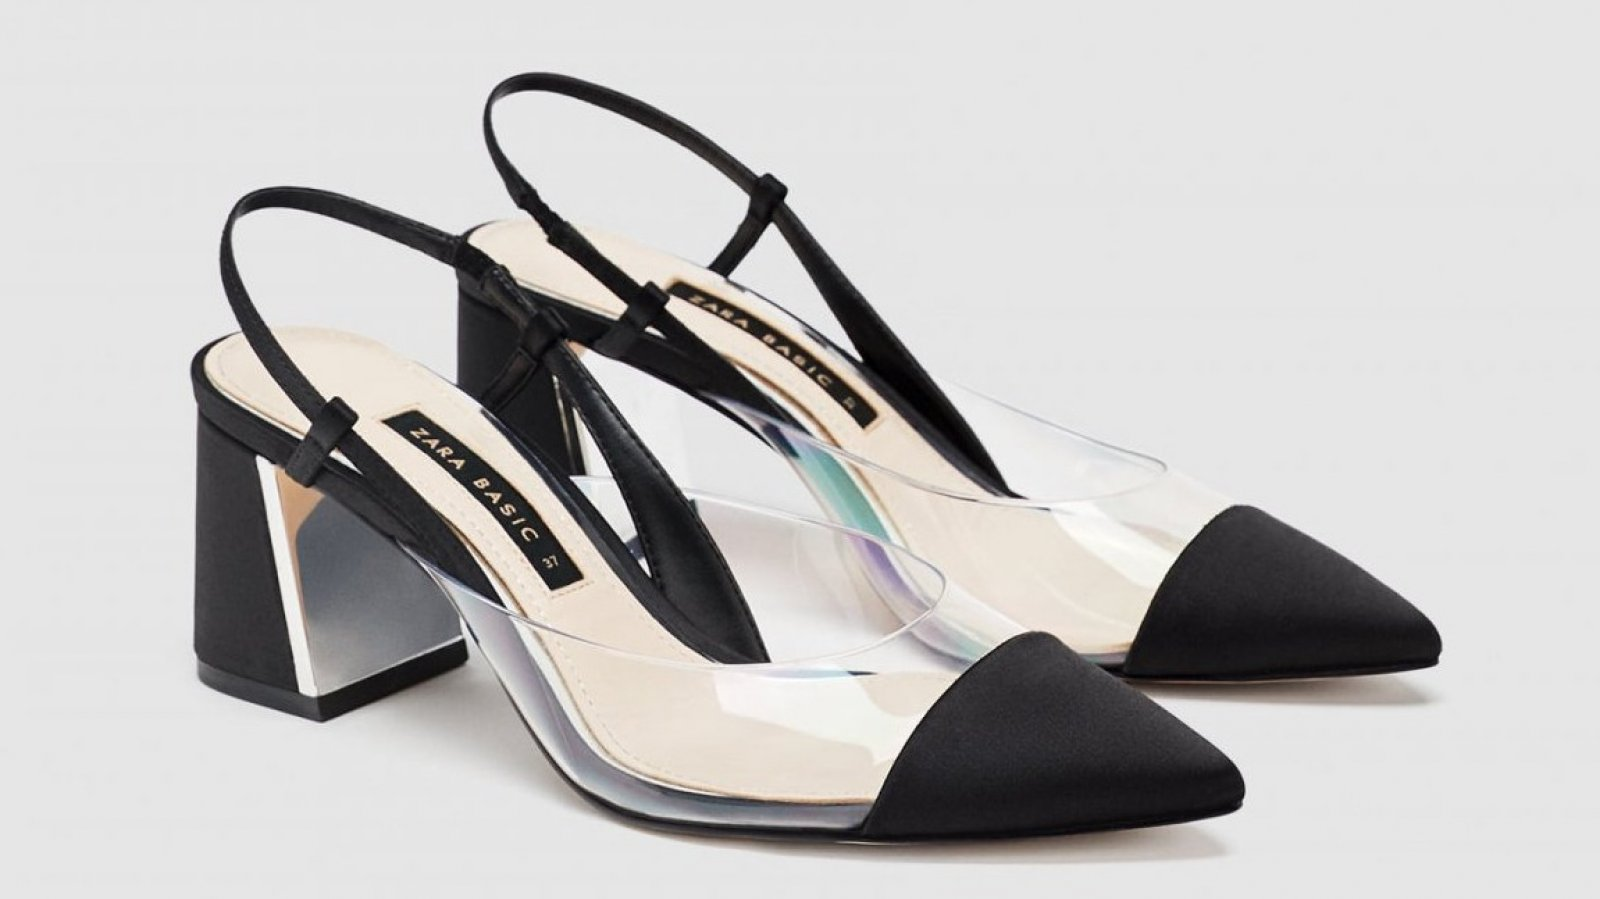 Los zapatos de salón destalonados con vinilo de Zara, por 35,95 euros.